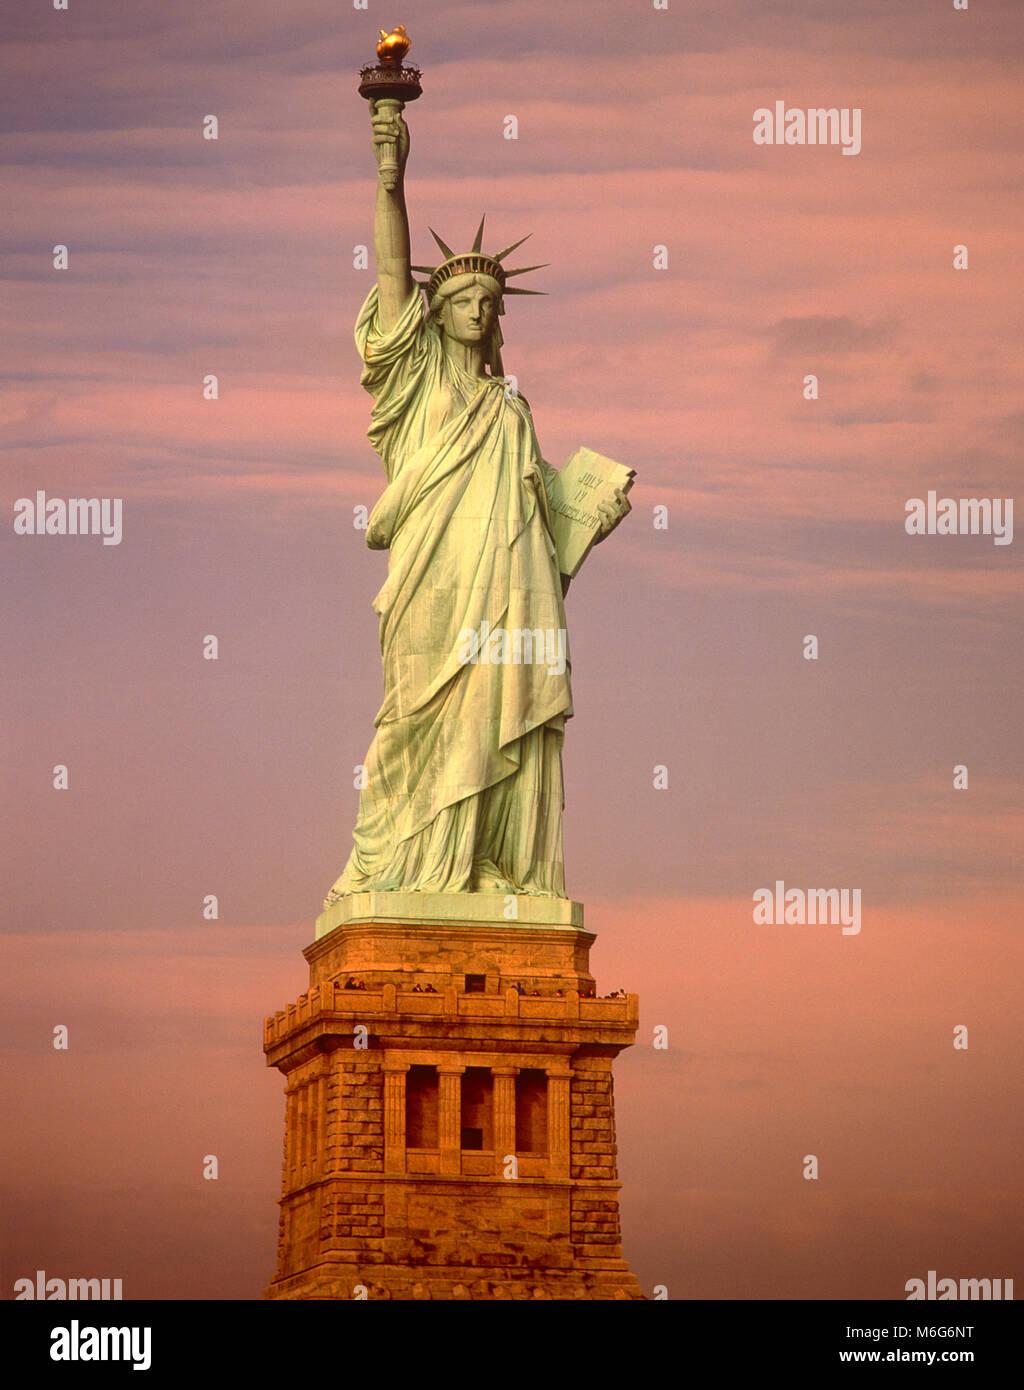 Statue of Liberty, Liberty Island, New York, USA Stockbild